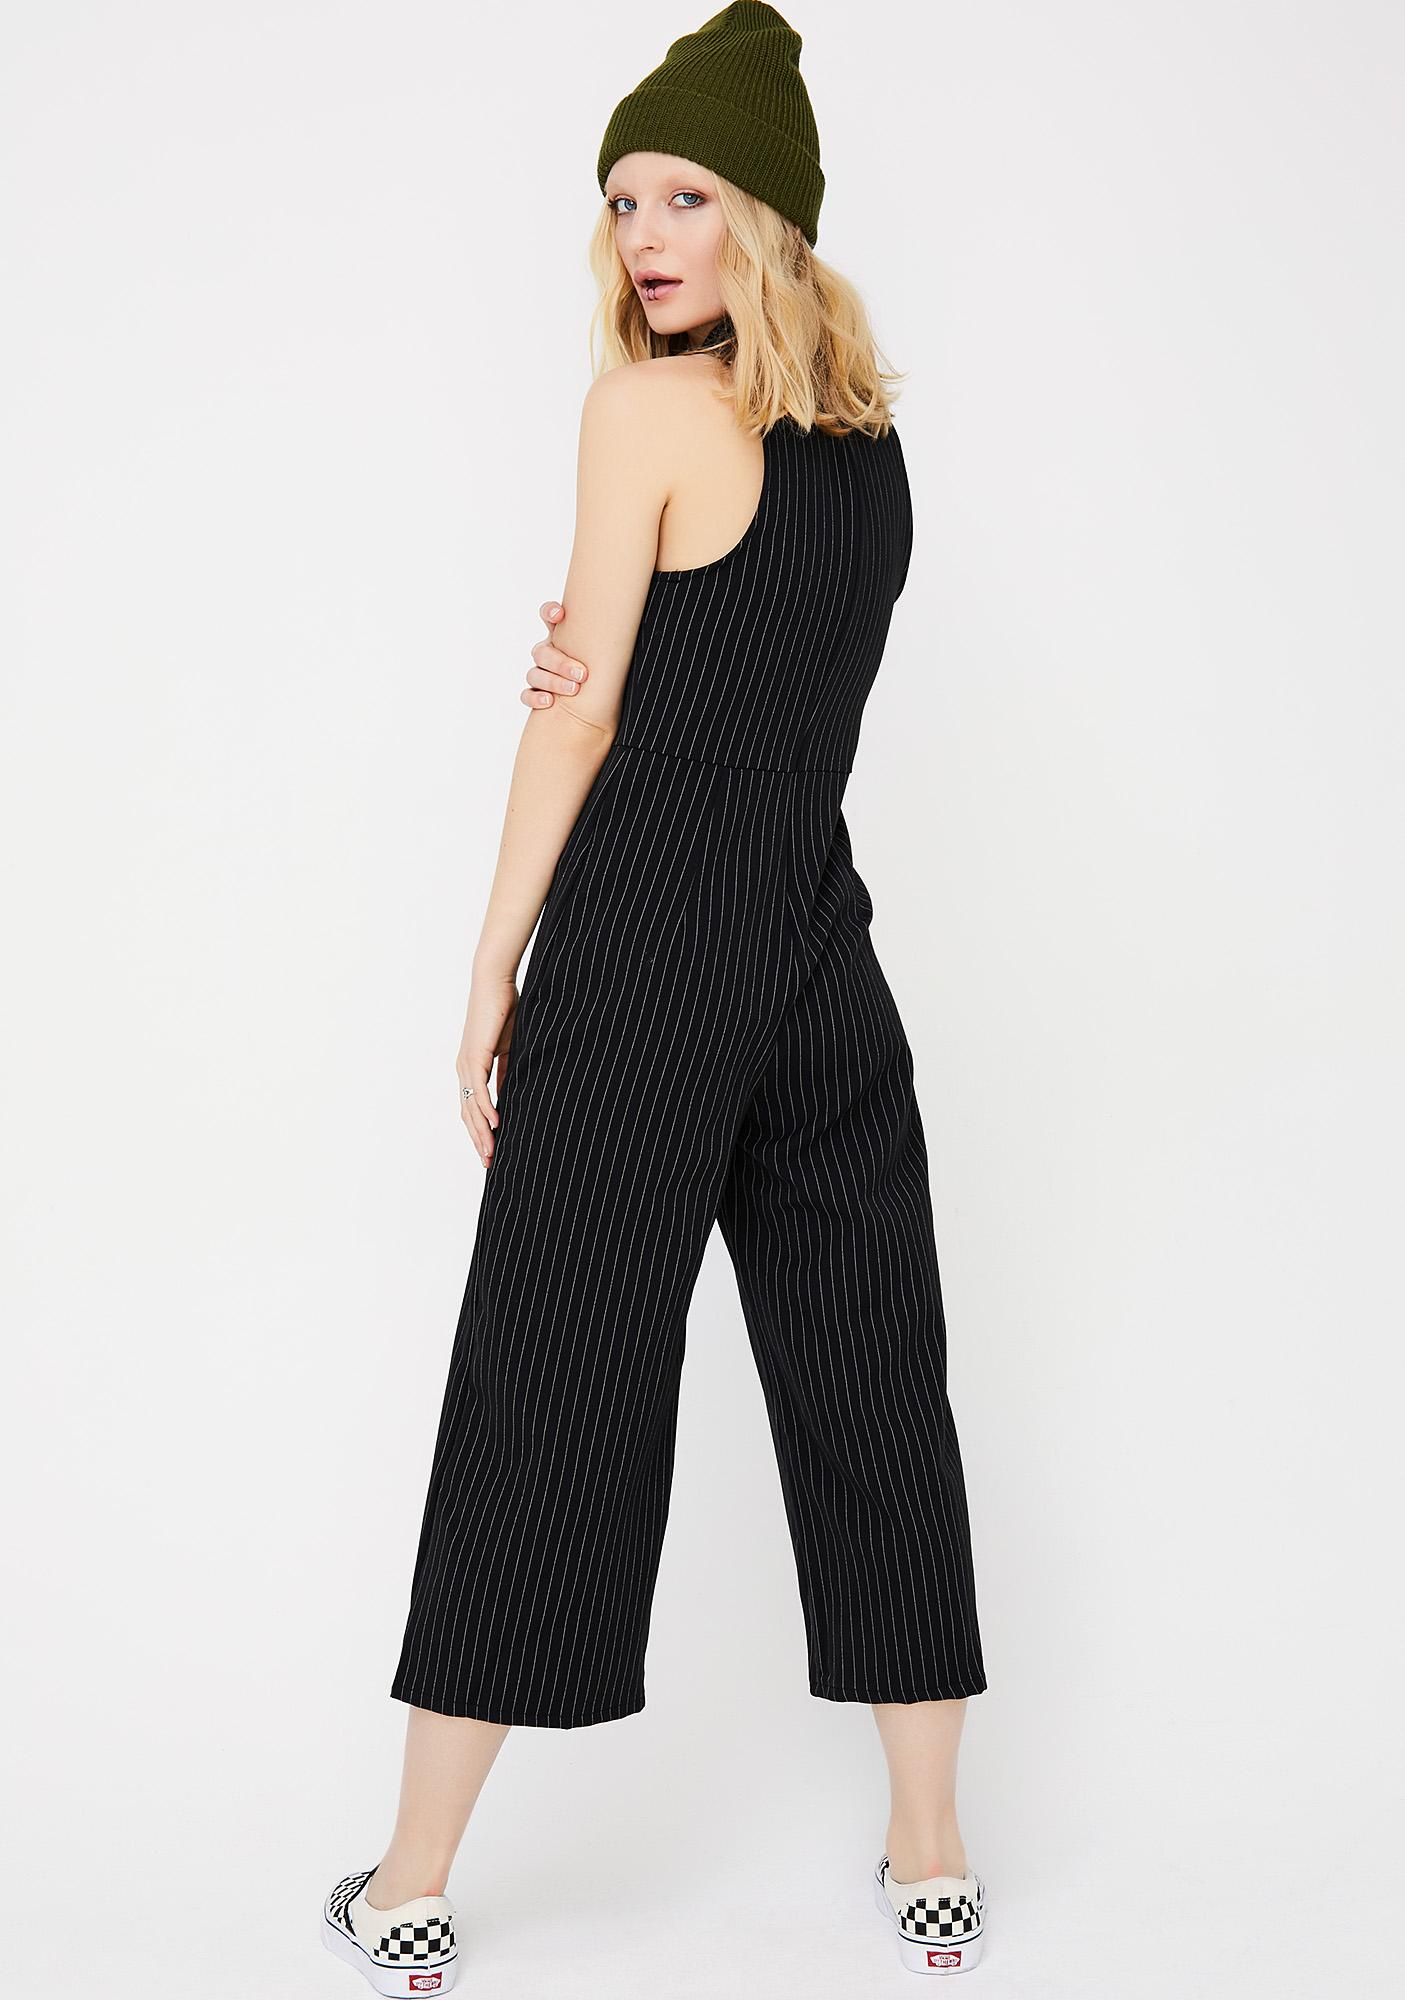 Mob Wifey Pinstripe Jumpsuit